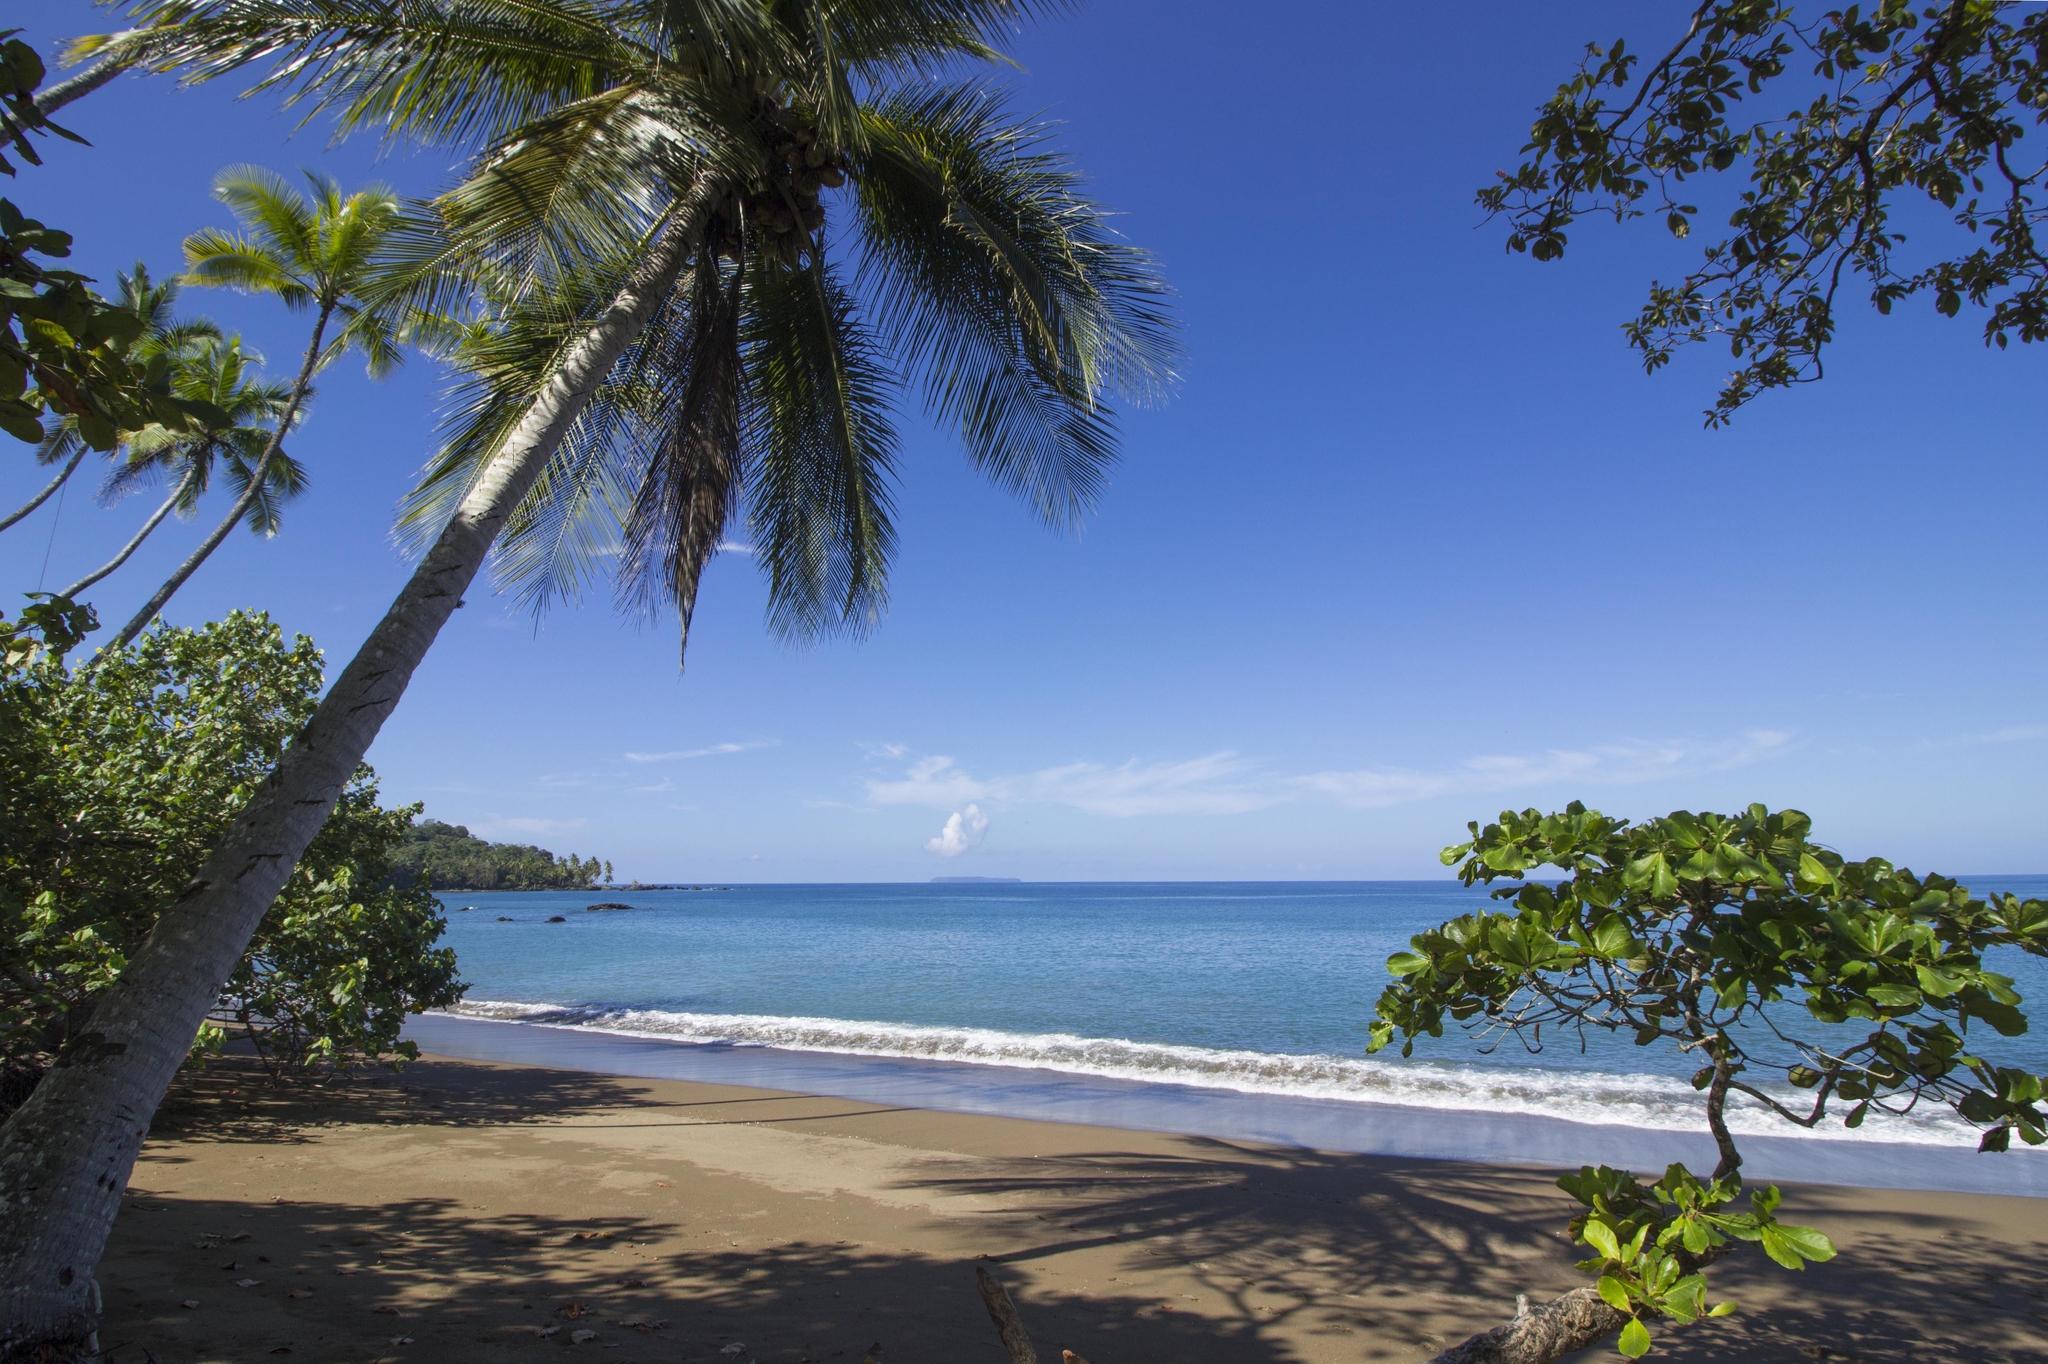 Plage paradisiaque à Drake Bay